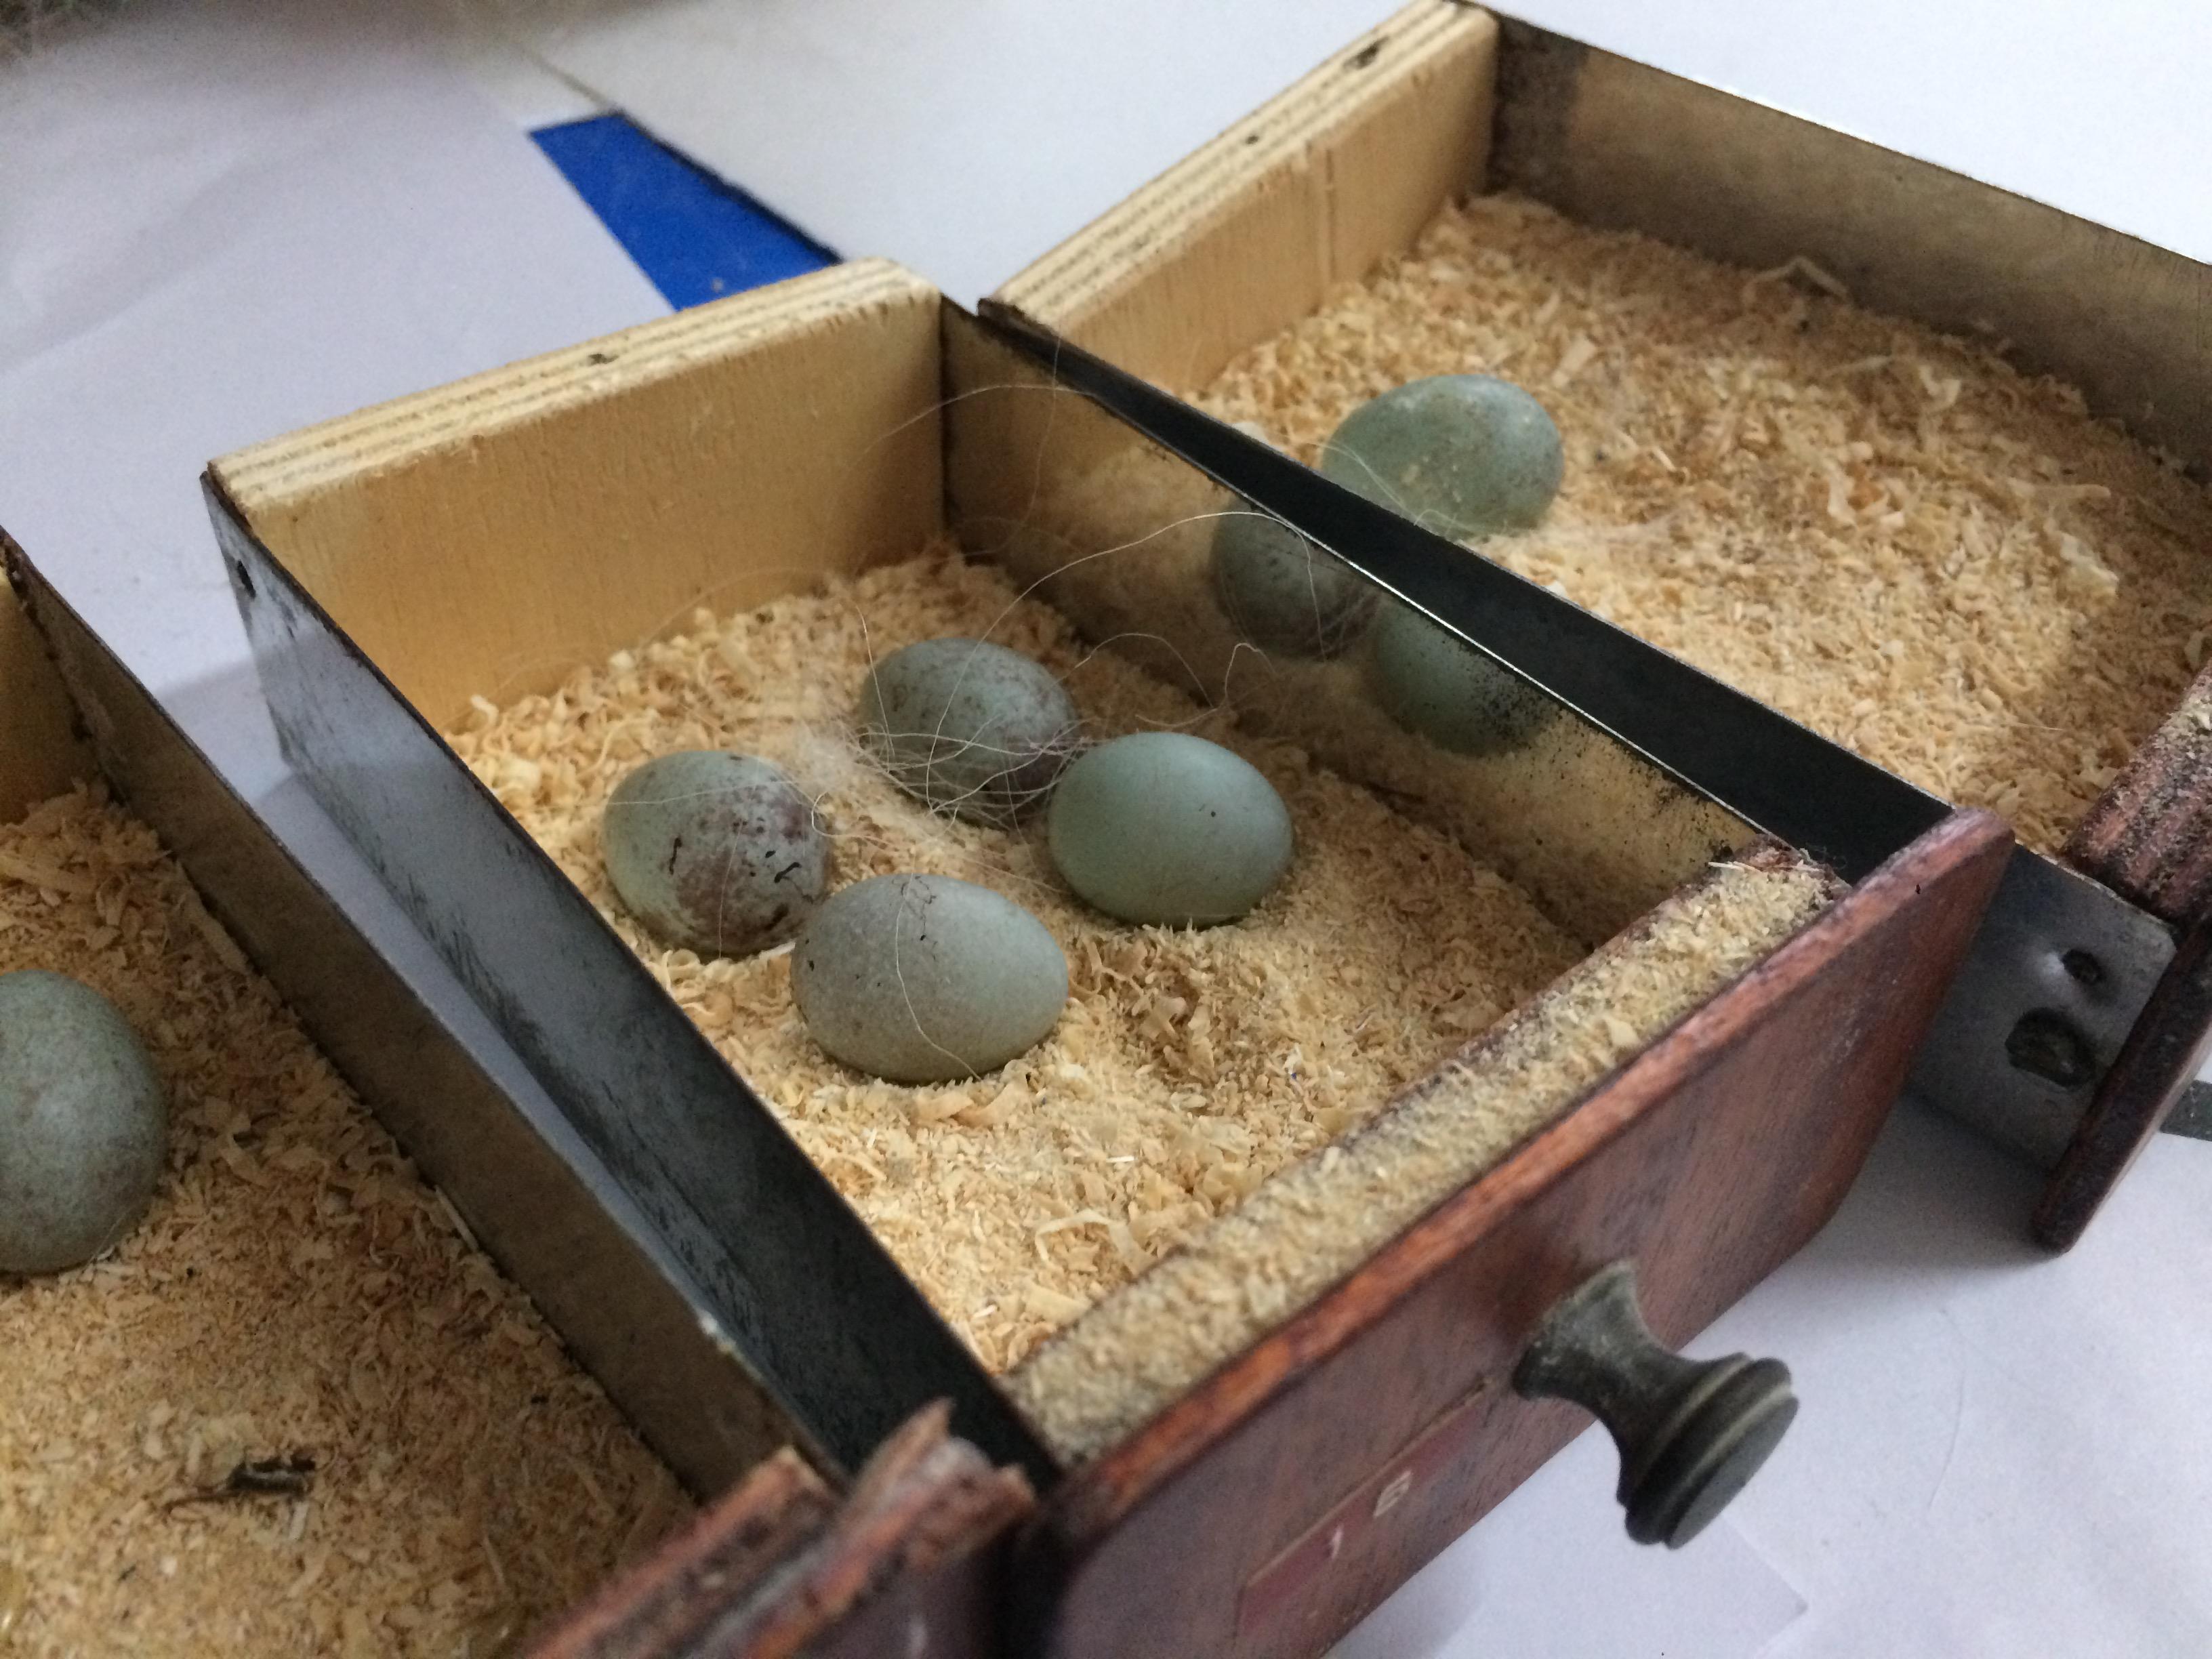 2 huevos tipos de canarios de postura giboso espanol